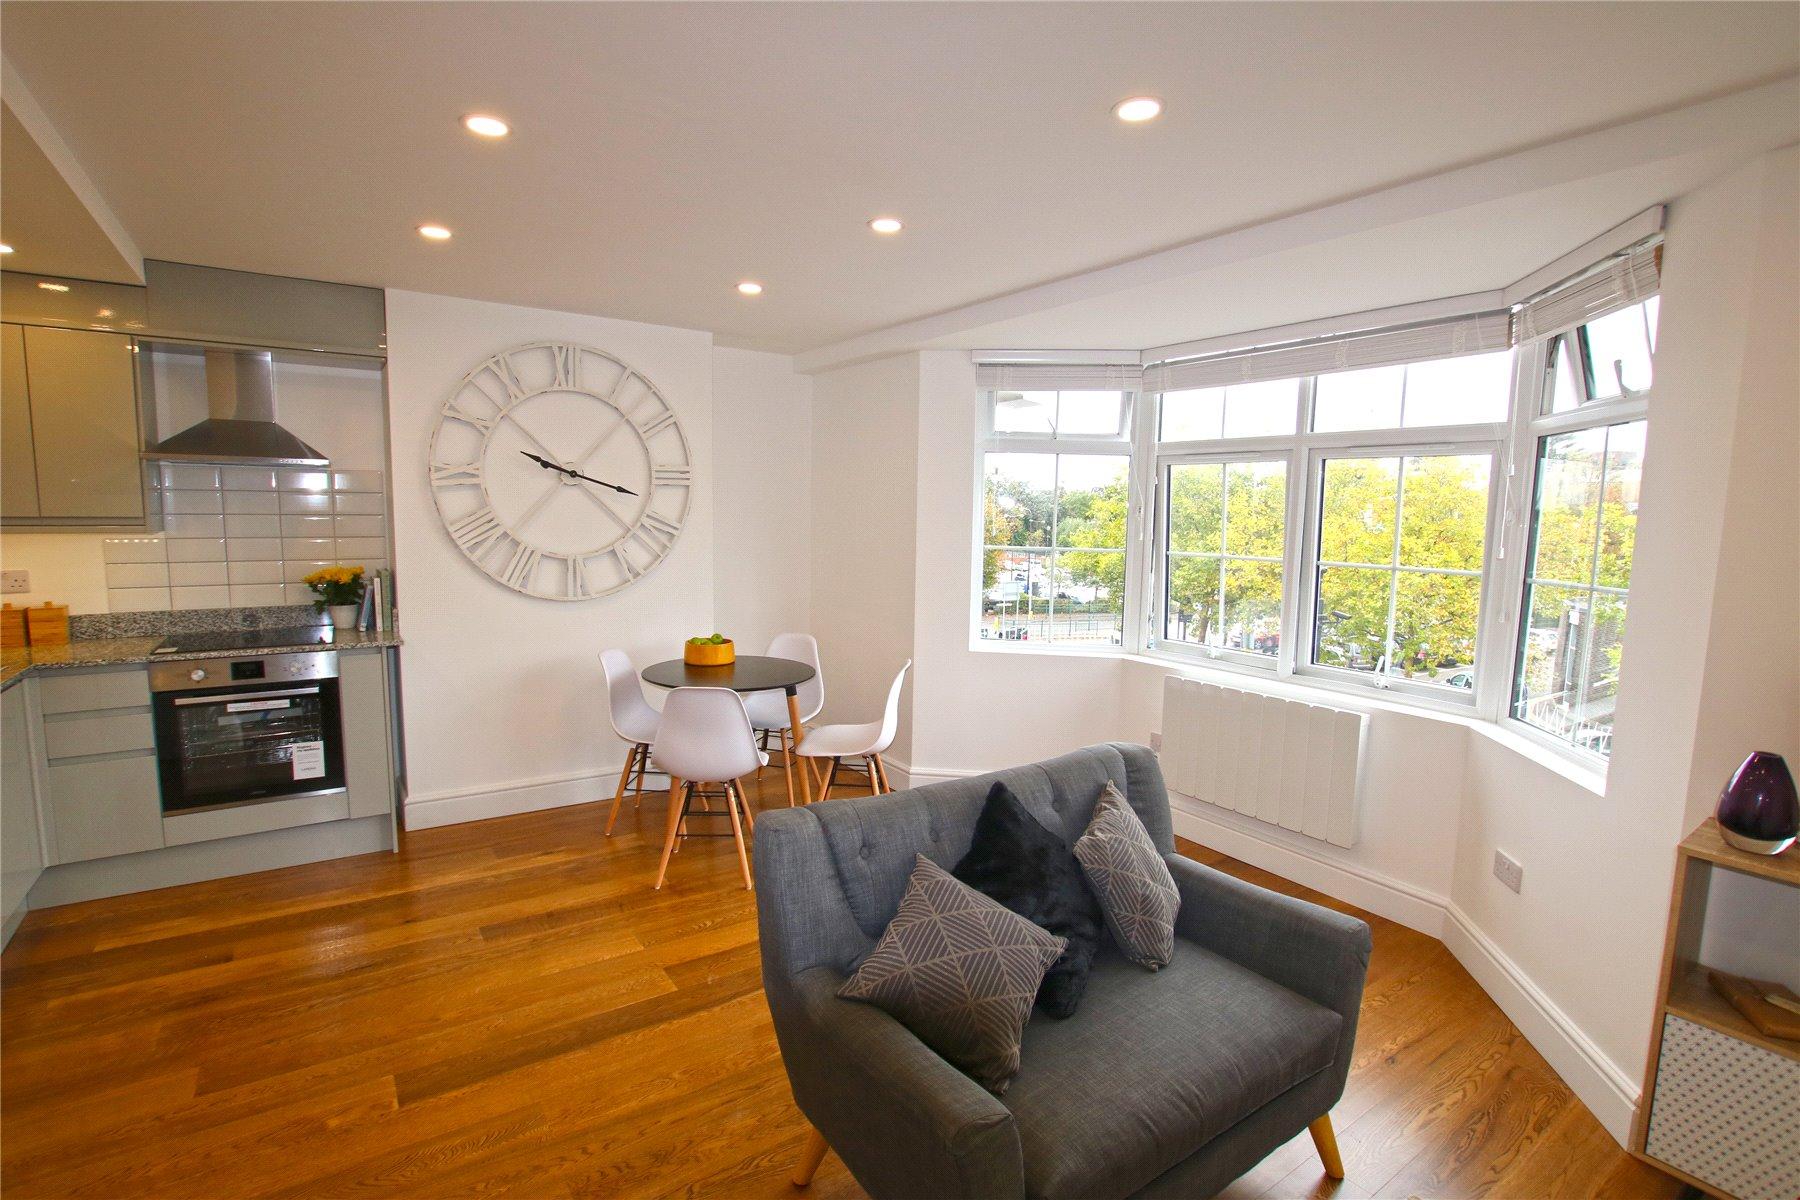 1 Bedroom Flat For Sale In West Byfleet Surrey Kt14 London